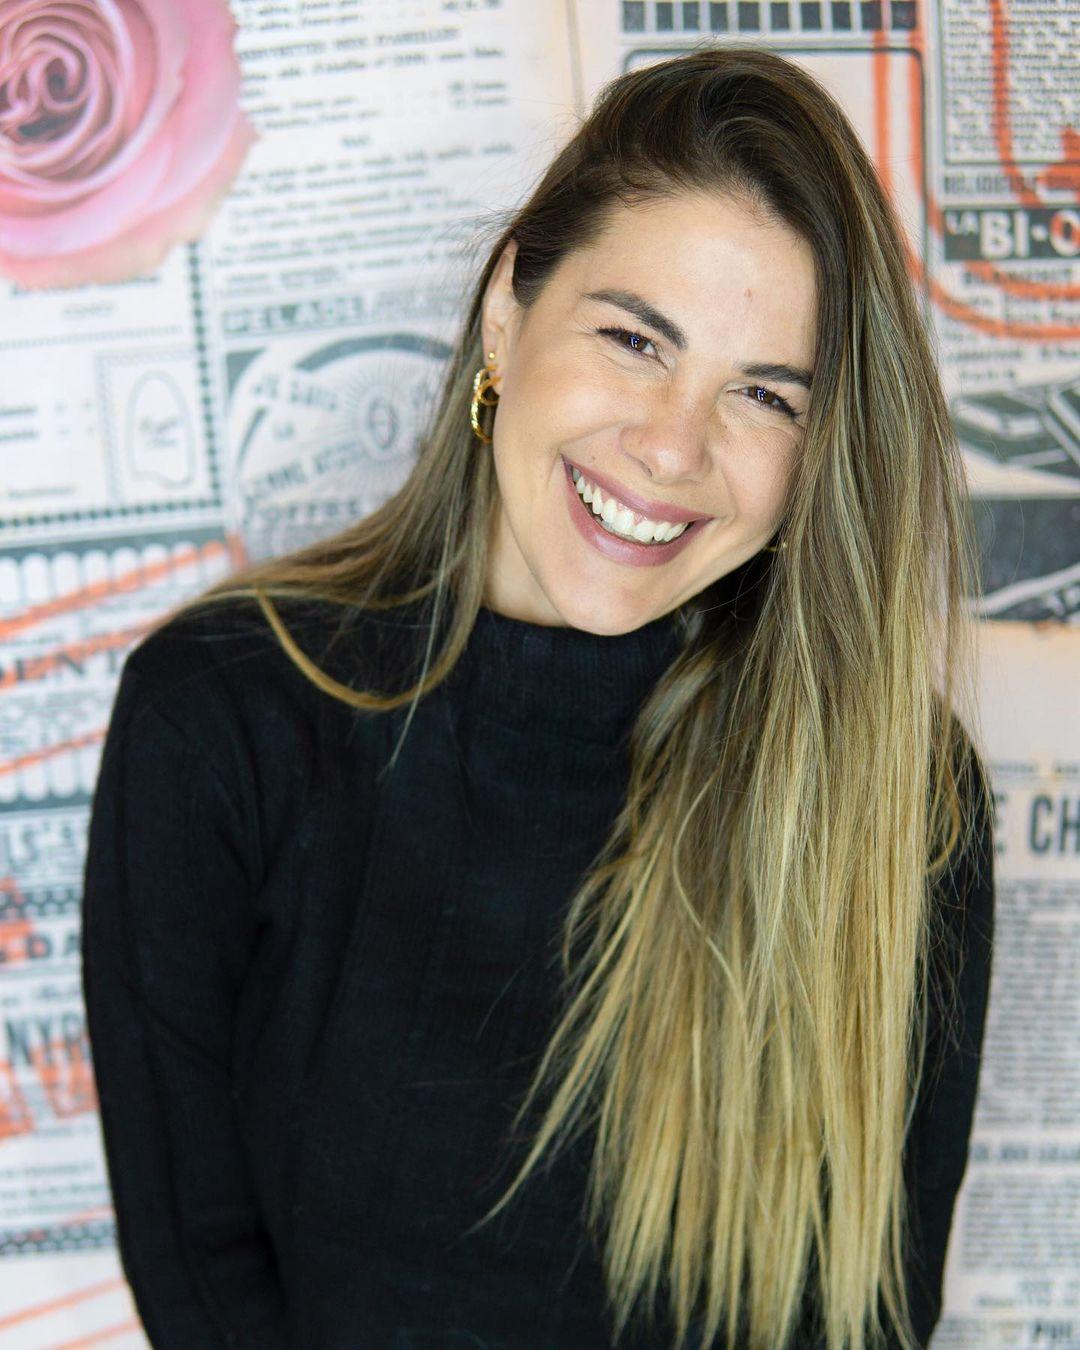 Laura Prieto comparte potente mensaje de amor propio